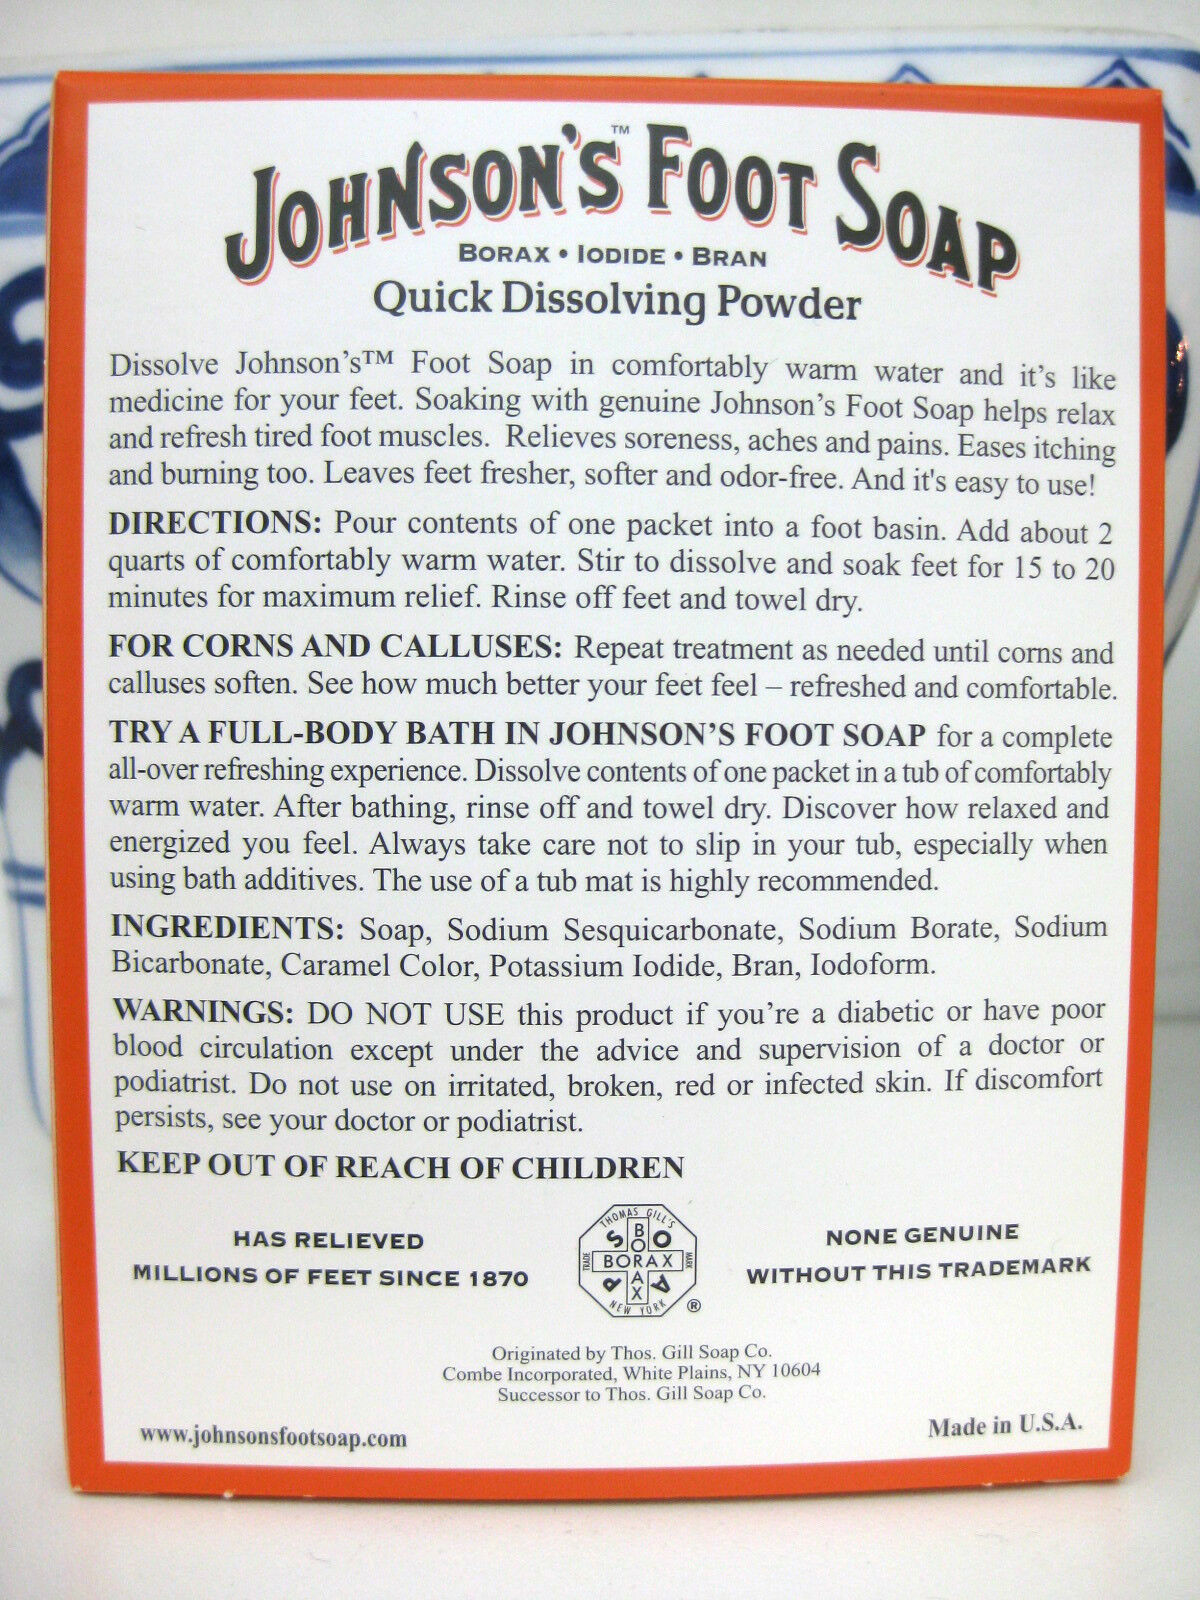 JOHNSON'S Foot Soap Soak Powder Borax, Iodide, & Bran Packets 4 Each image 2